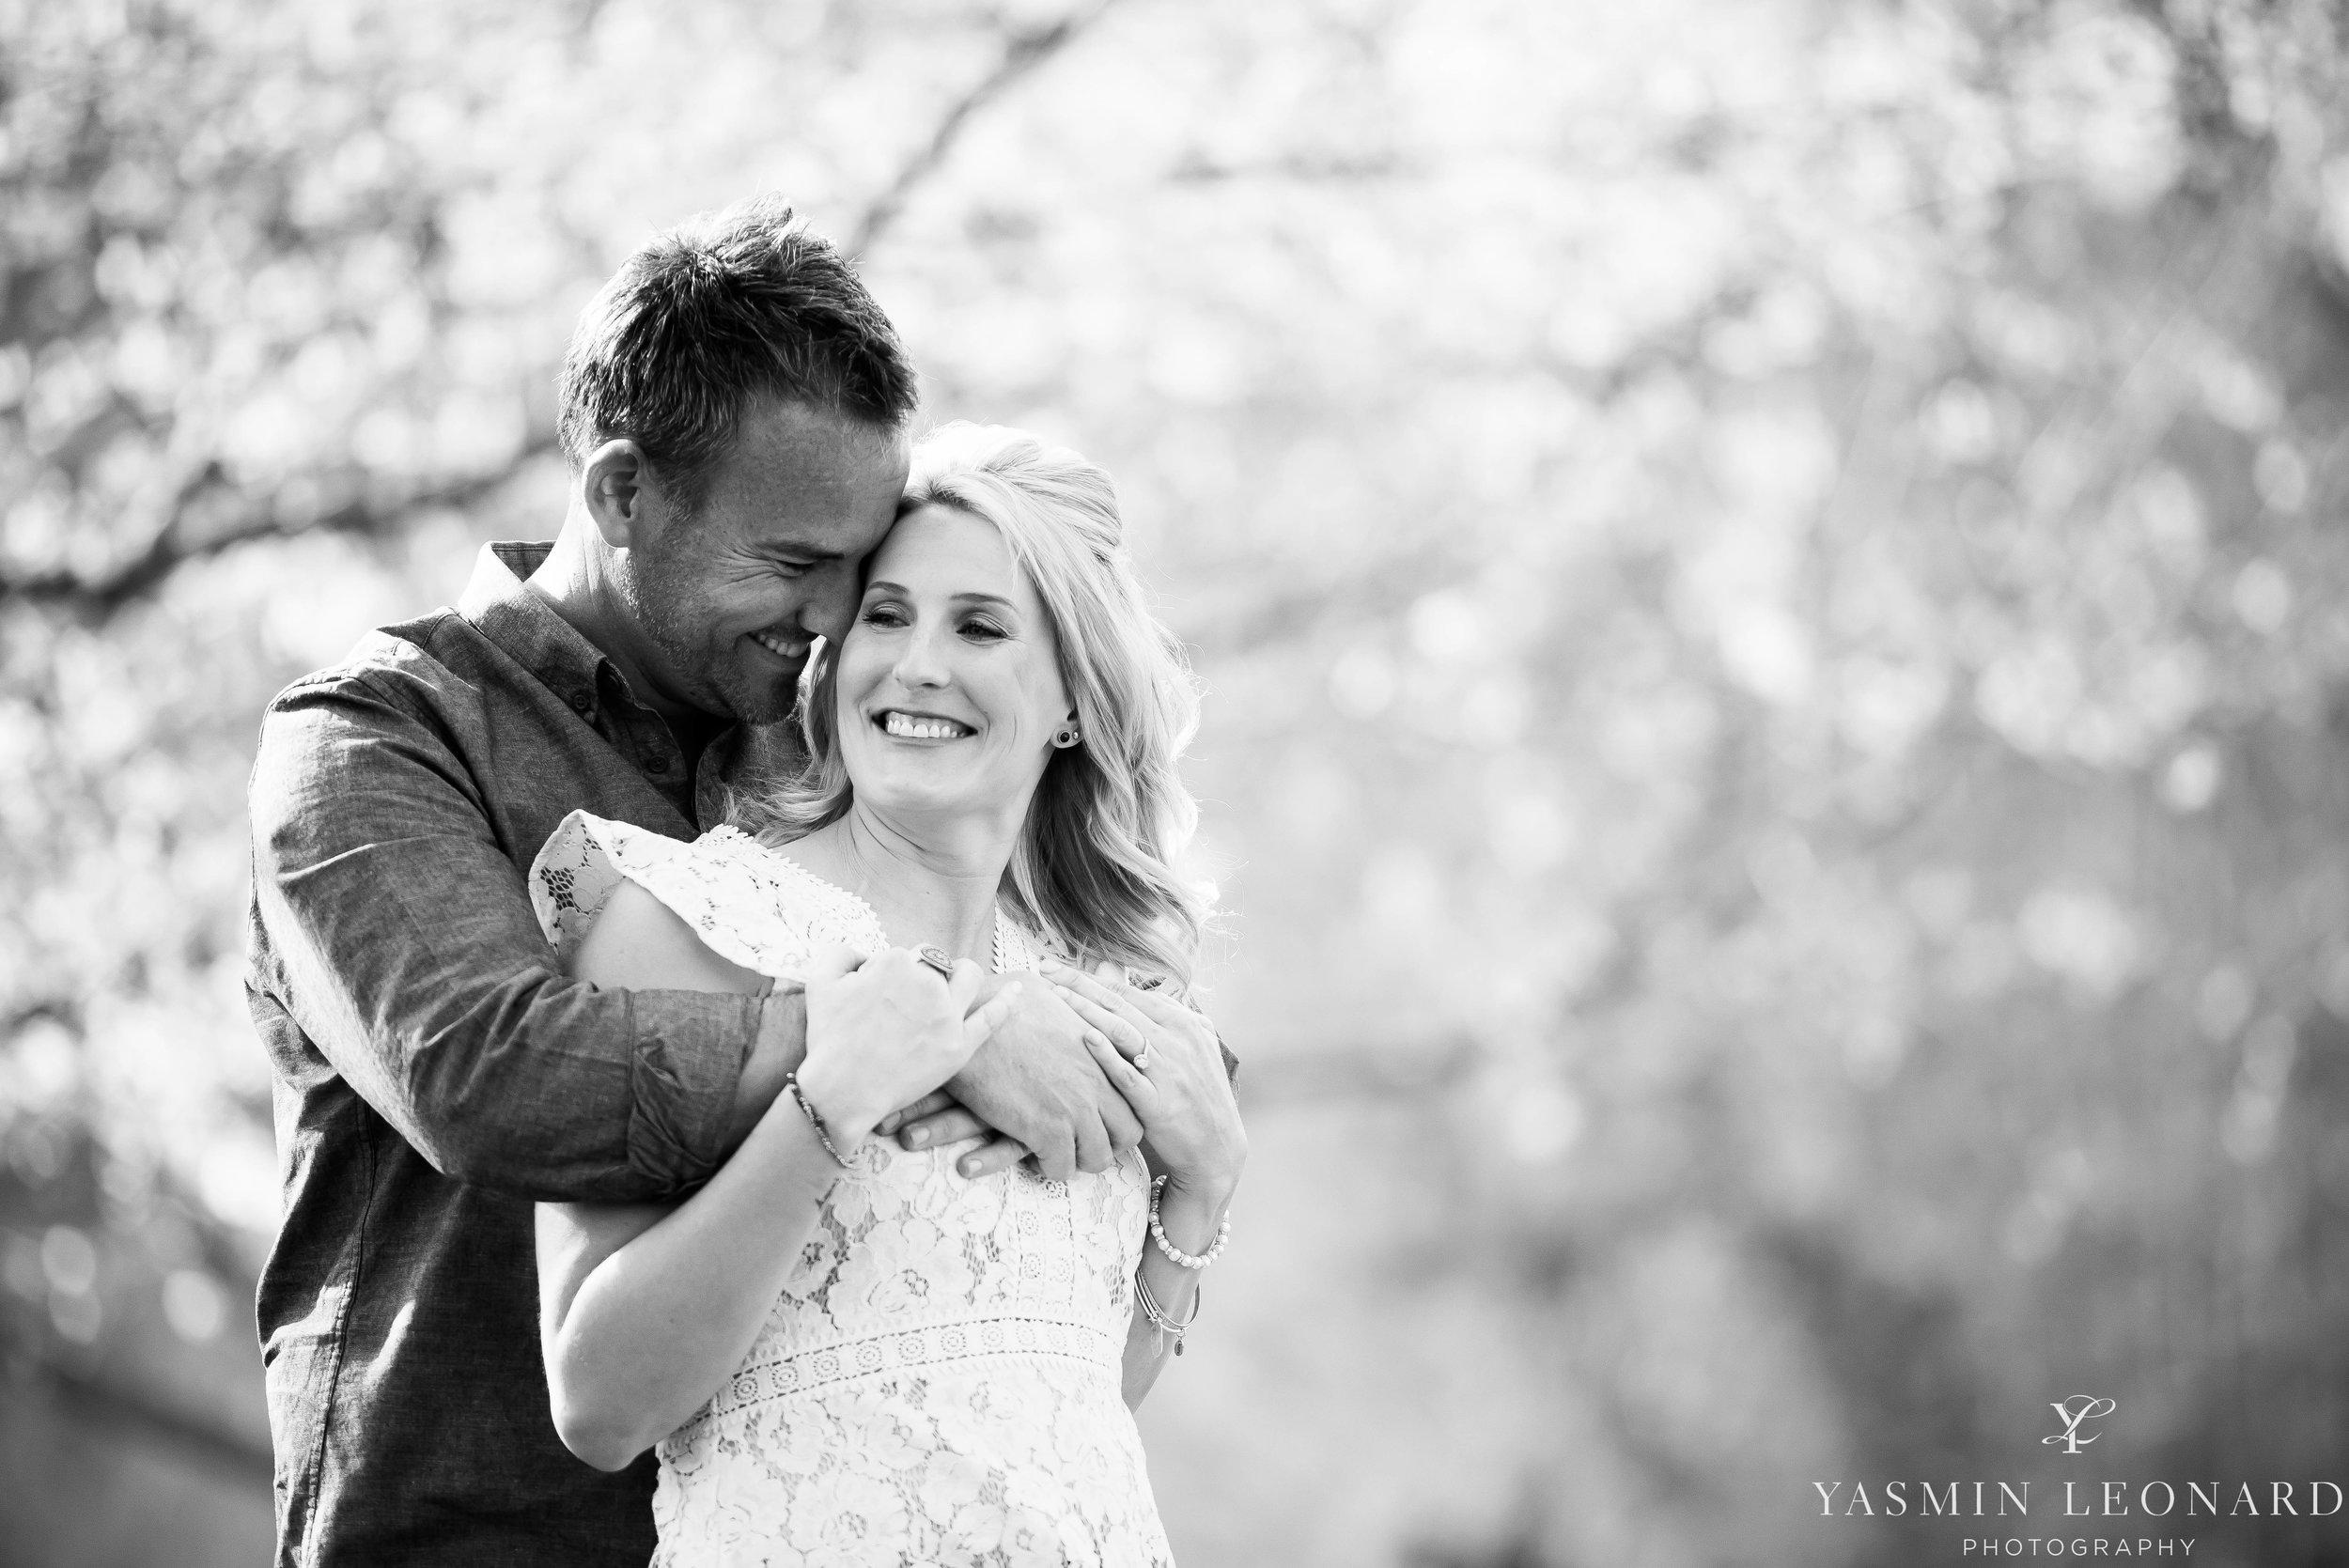 High Point Wedding Photographer - NC Wedding Photographer - Yasmin Leonard Photography - Engagement Poses - Engagement Ideas - Outdoor Engagement Session-11.jpg